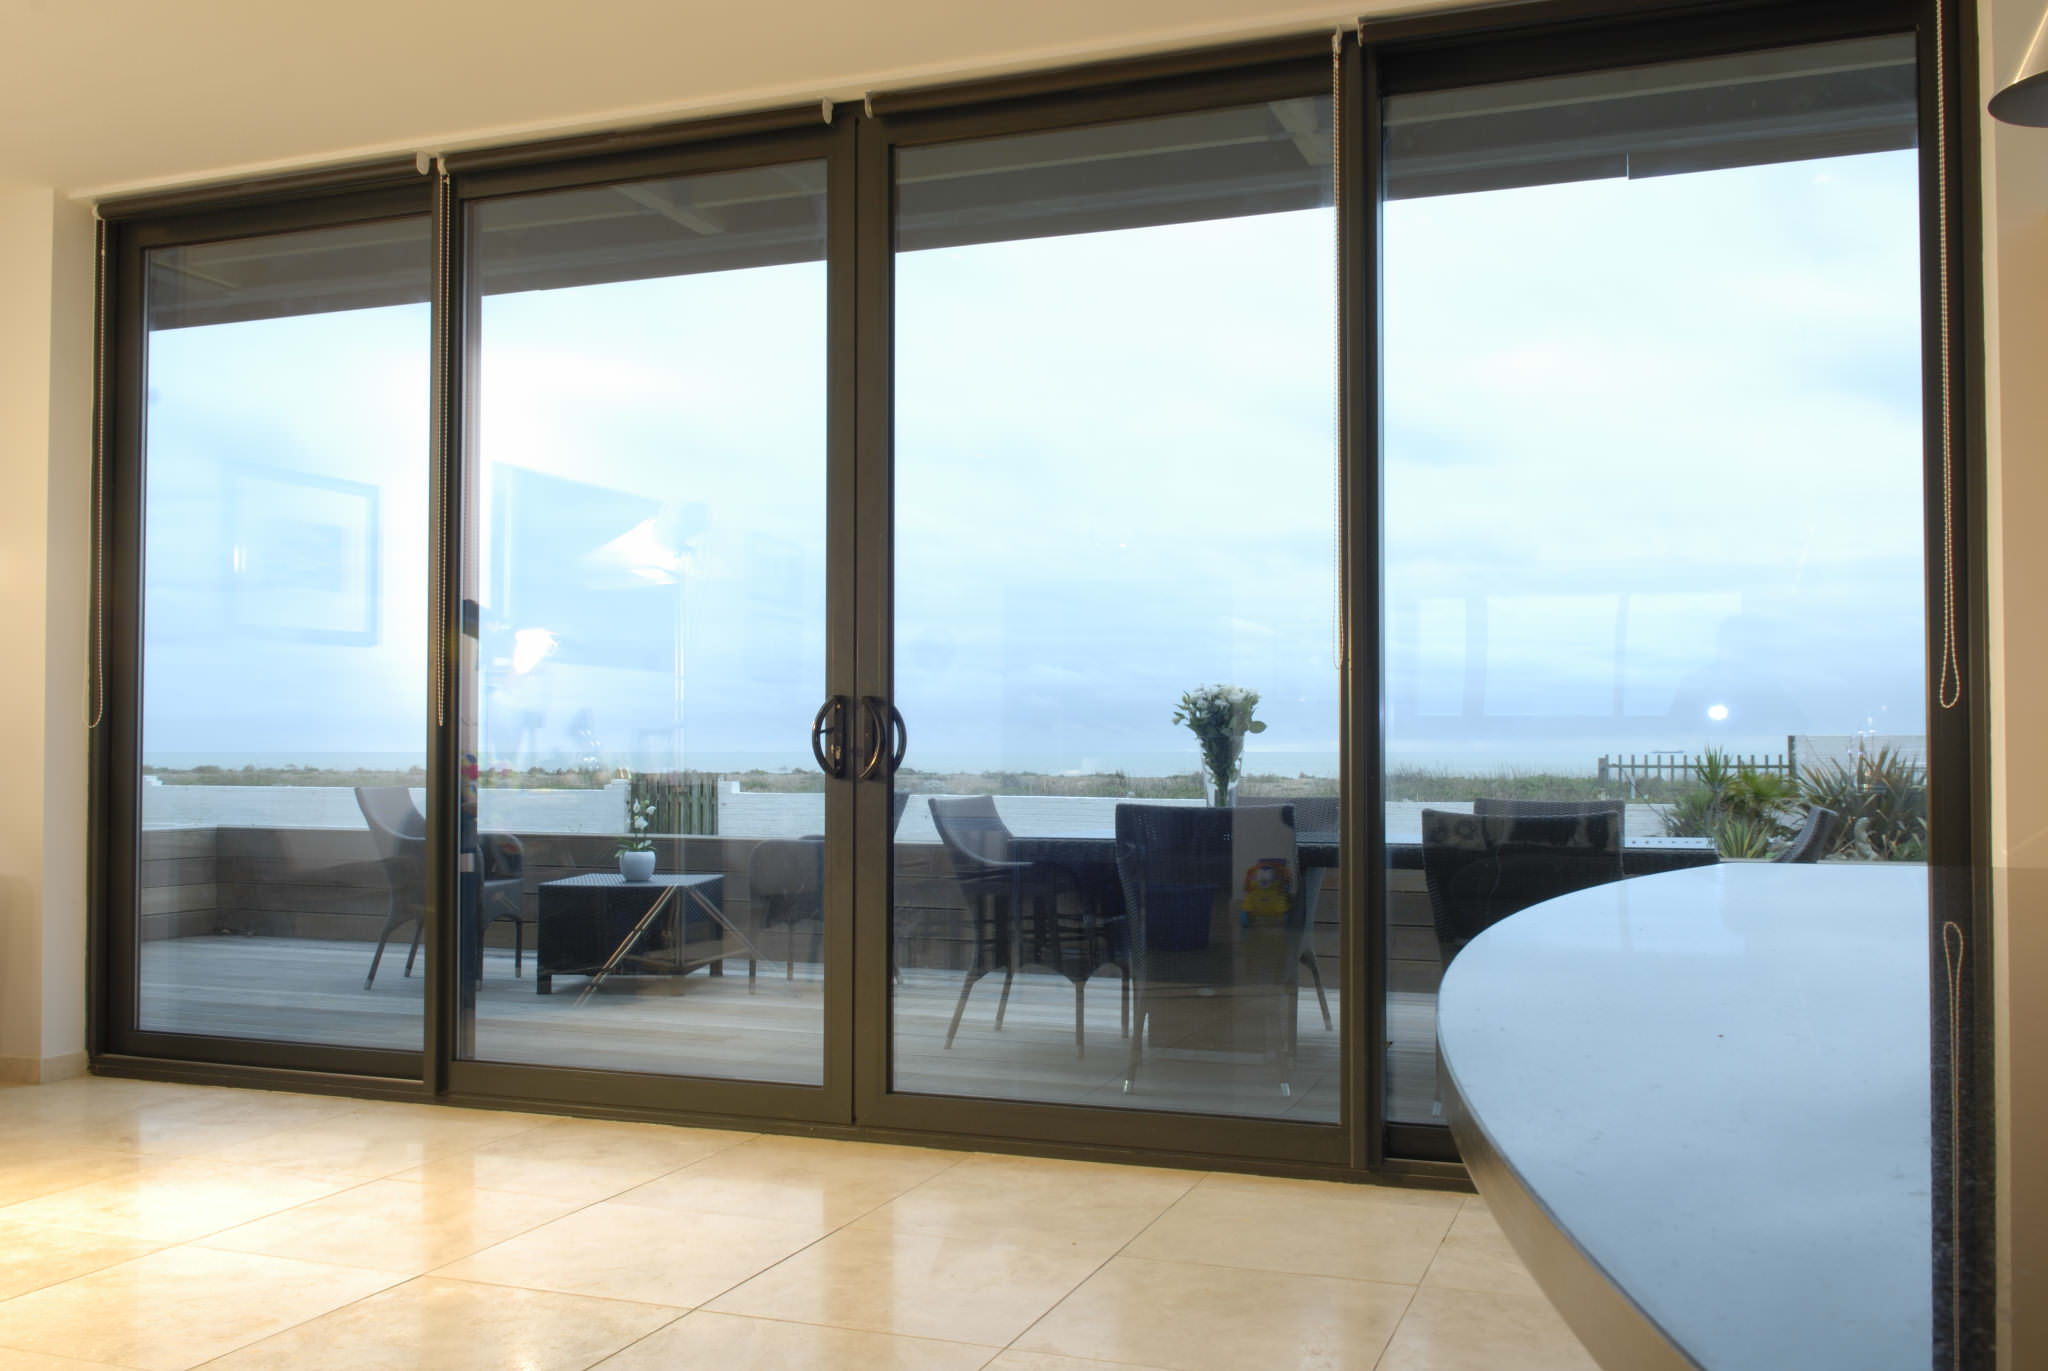 1371 #3D828E Aluminium Patio Doors Essex & Hertfordshire UPVC Doors pic Patio Doors With Side Windows 44912048